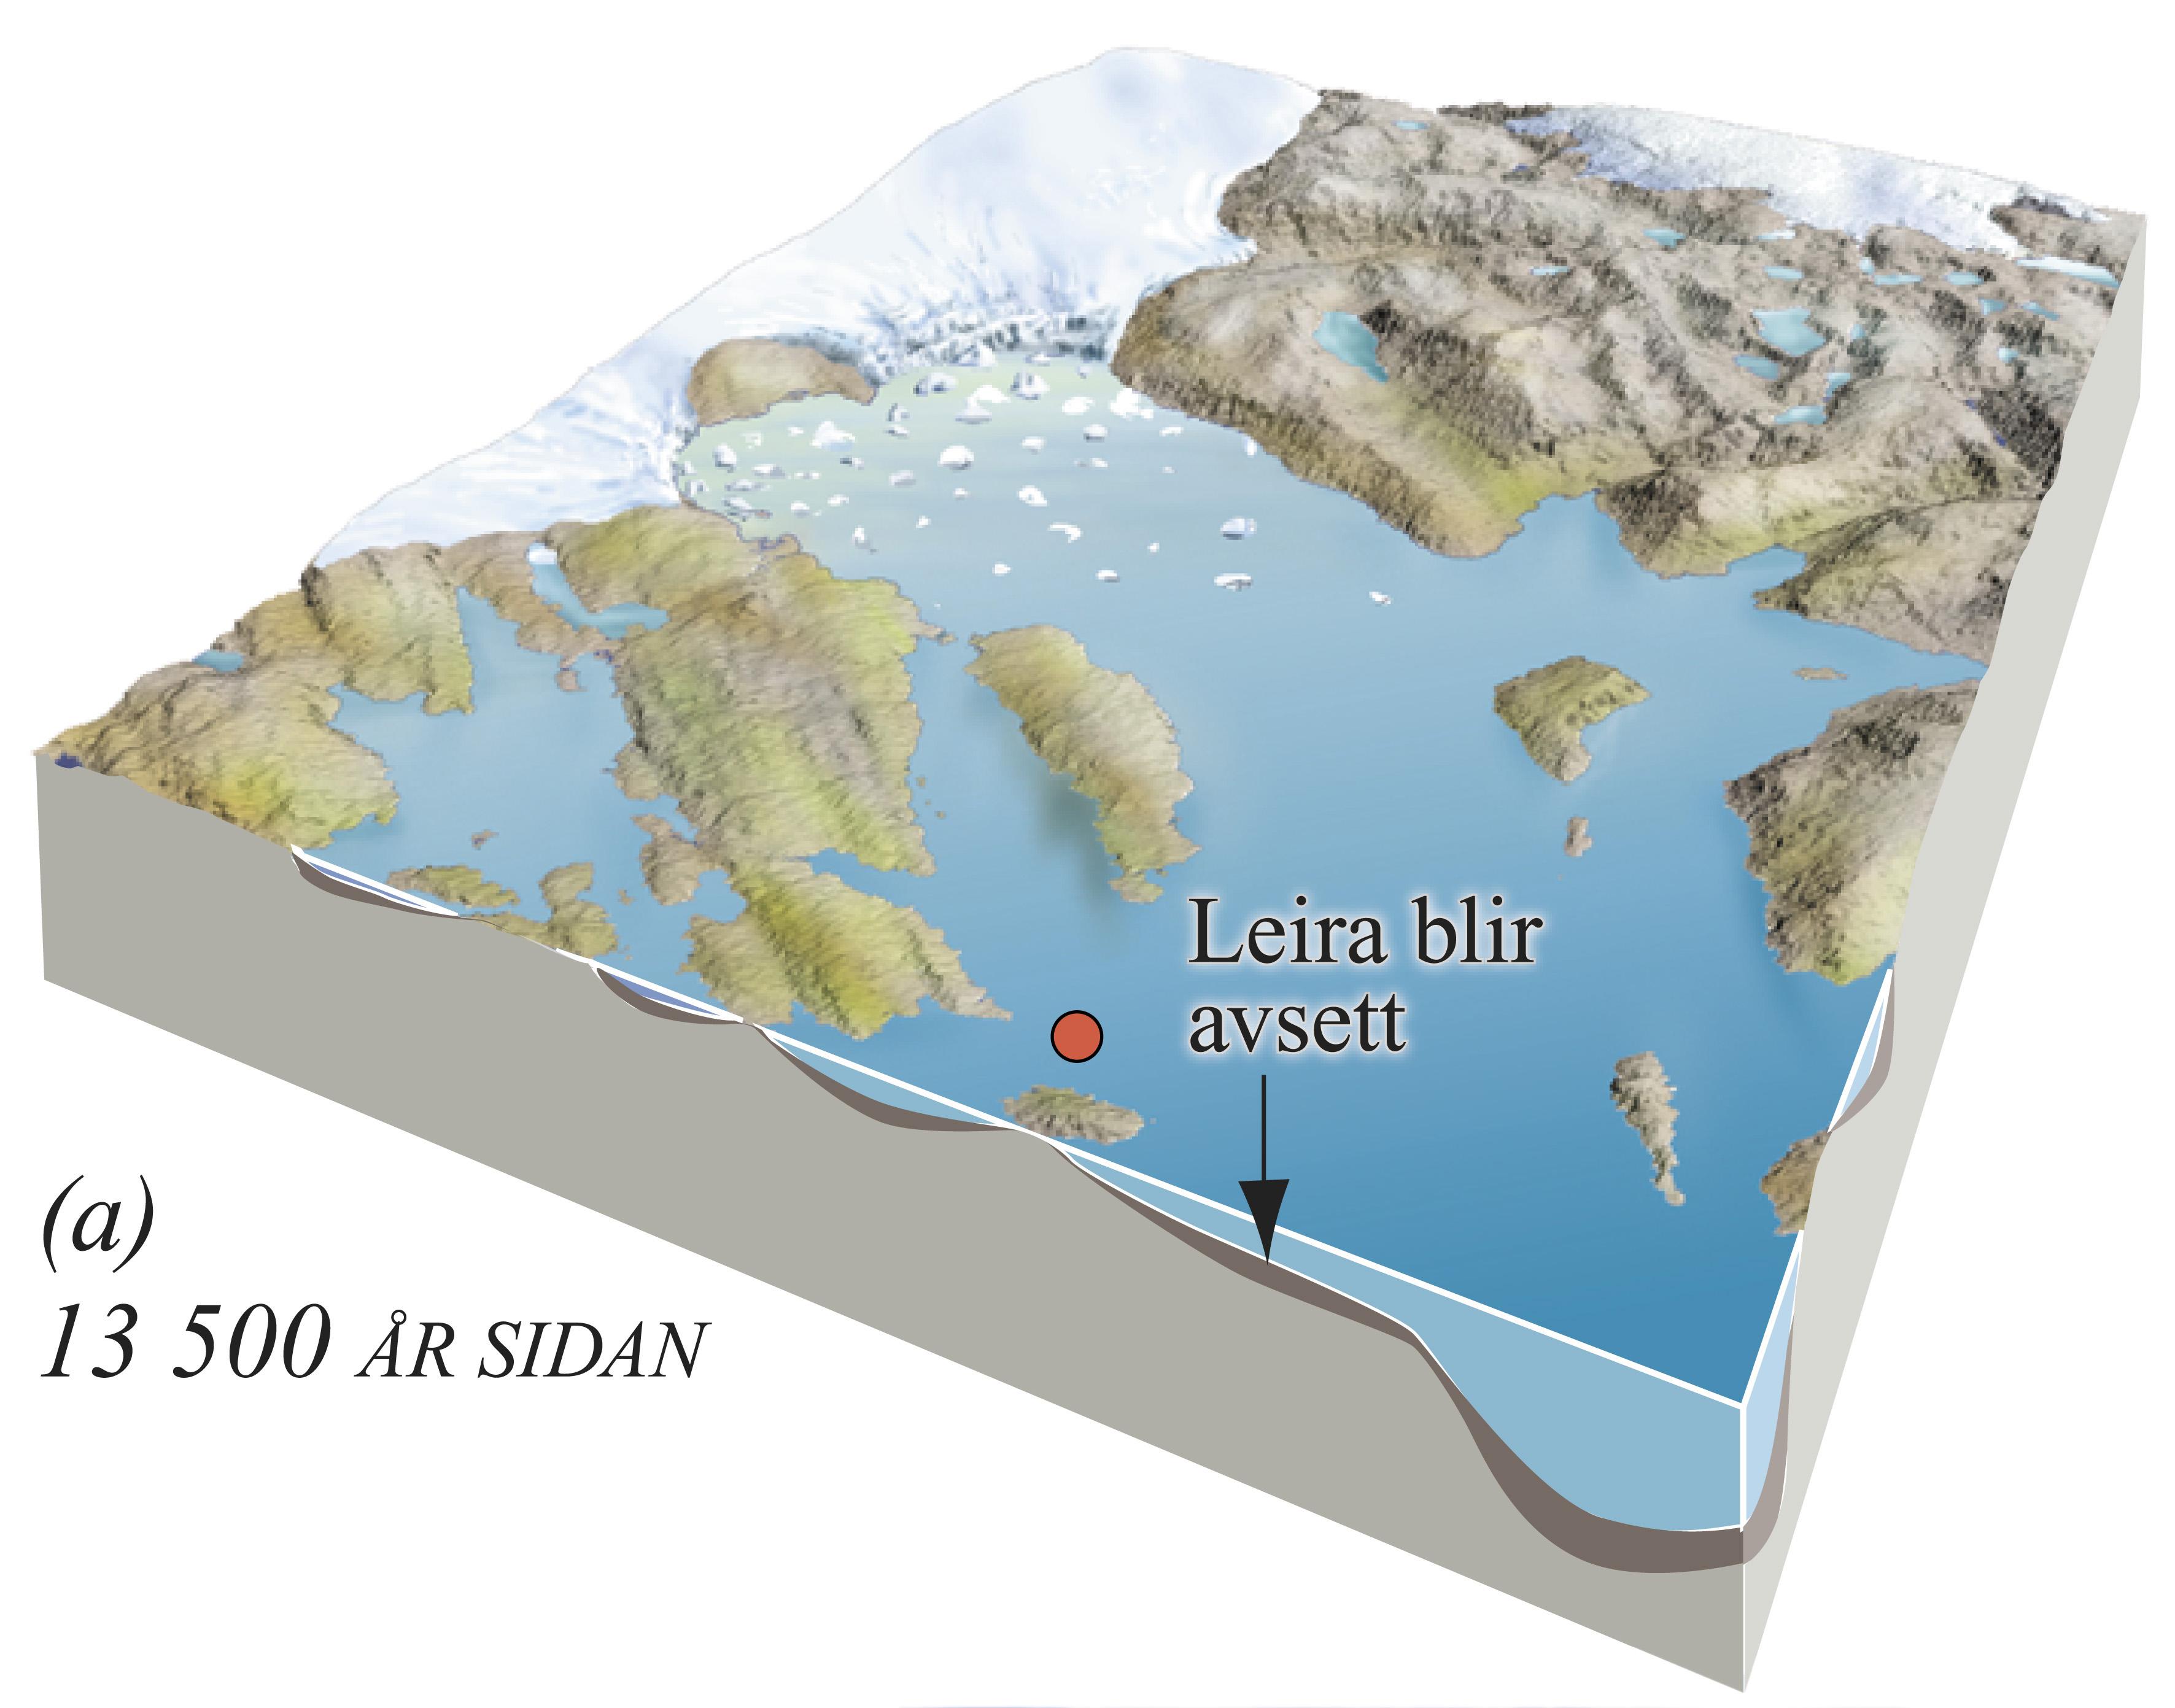 Utviklingsstadium i danninga av den harde leira i Ølve. (a) 13 500 år sidan